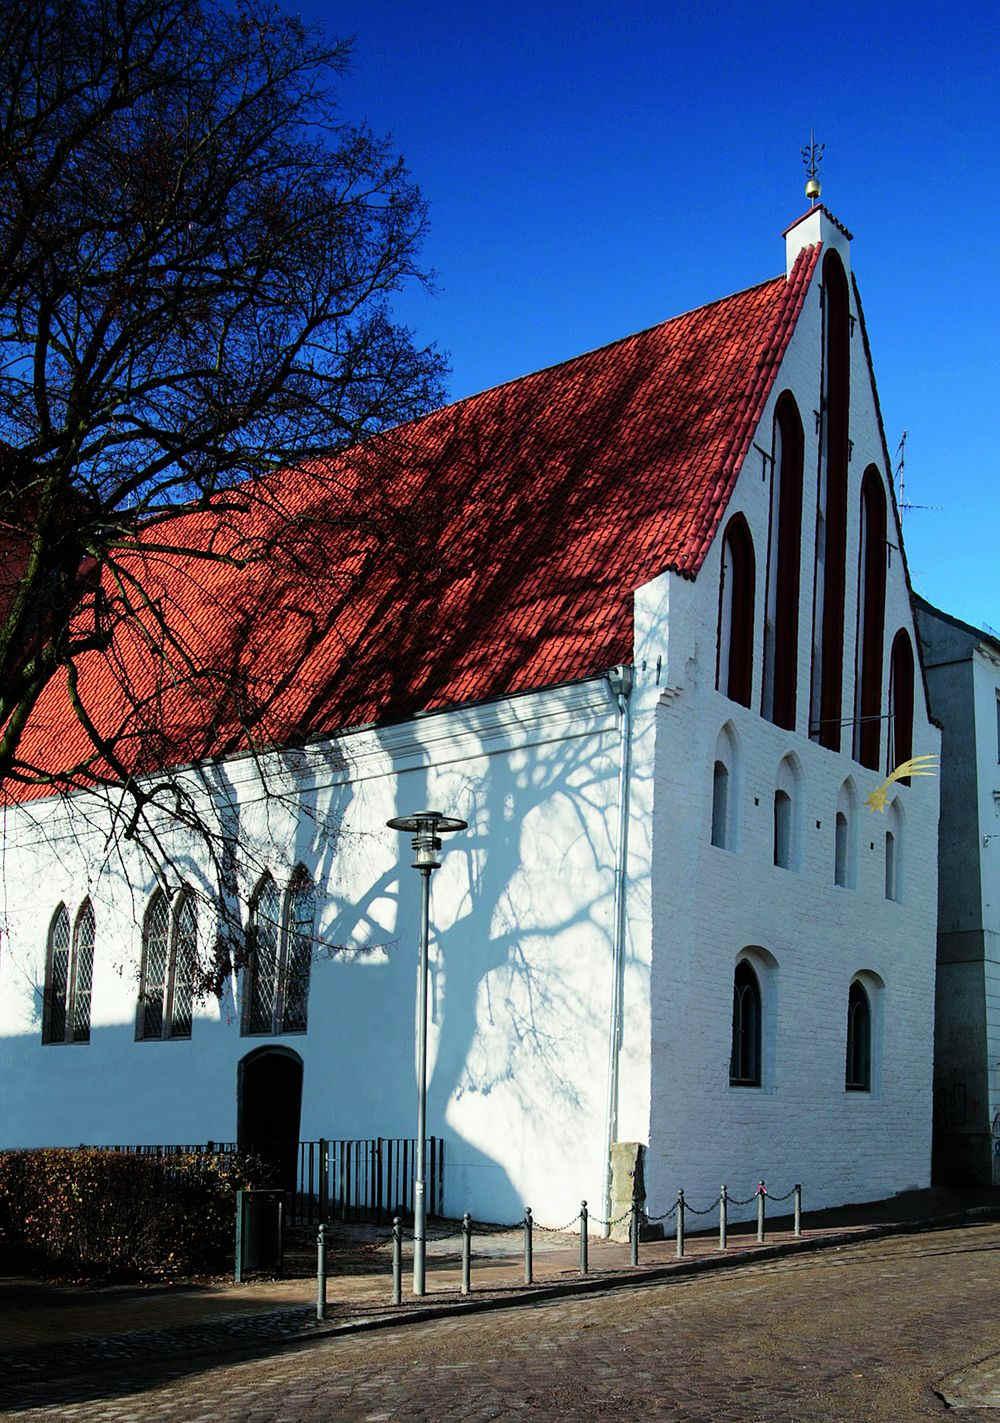 Heilig-Geist-Kirche, Güstrow